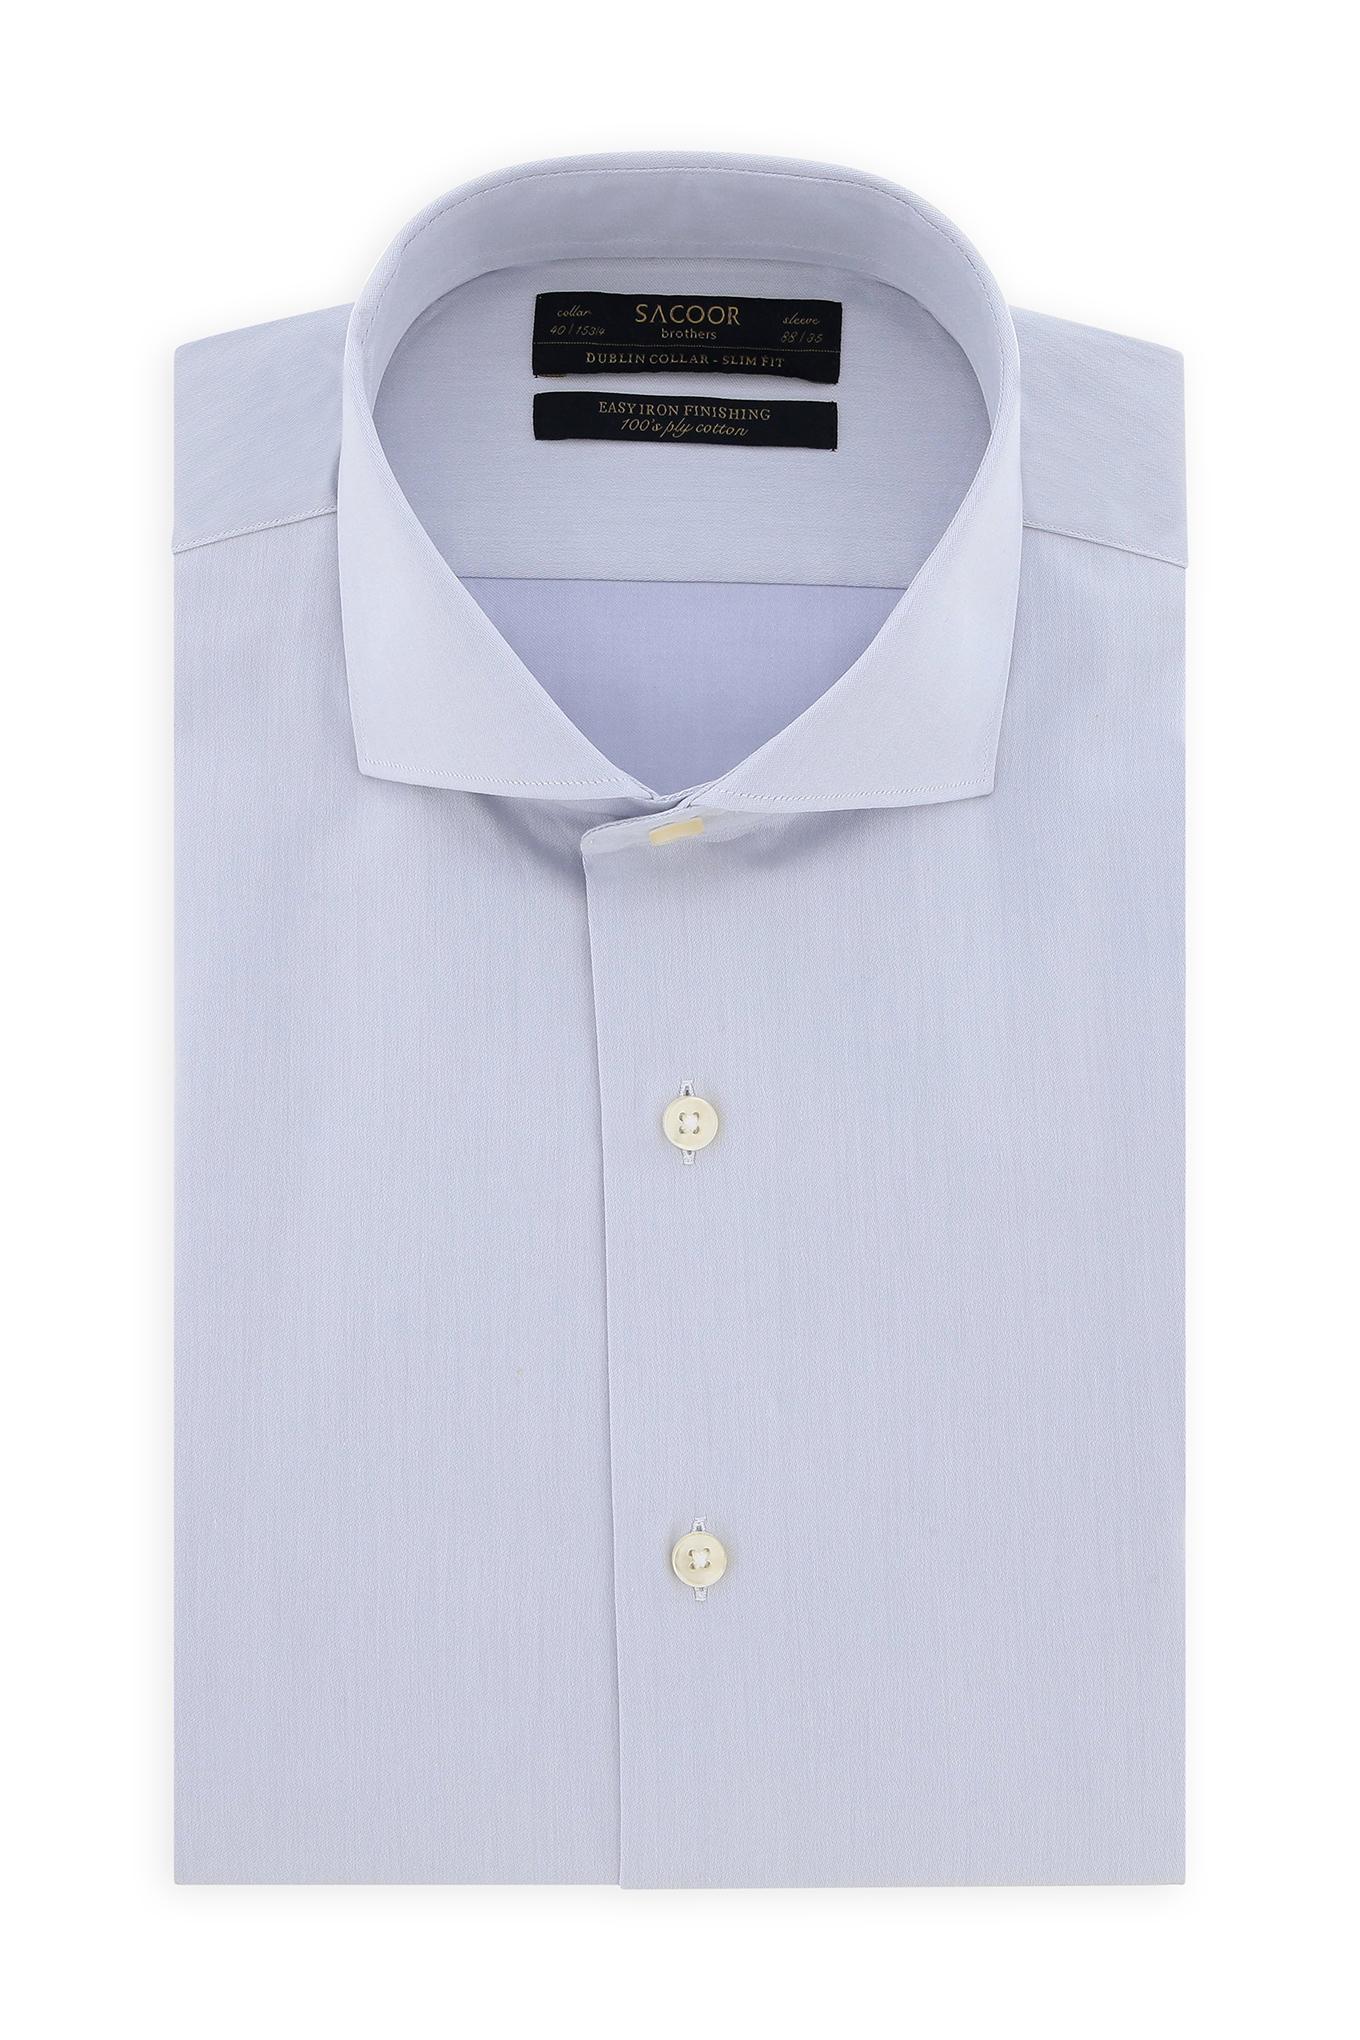 Camisa Cinza Claro Classic Homem